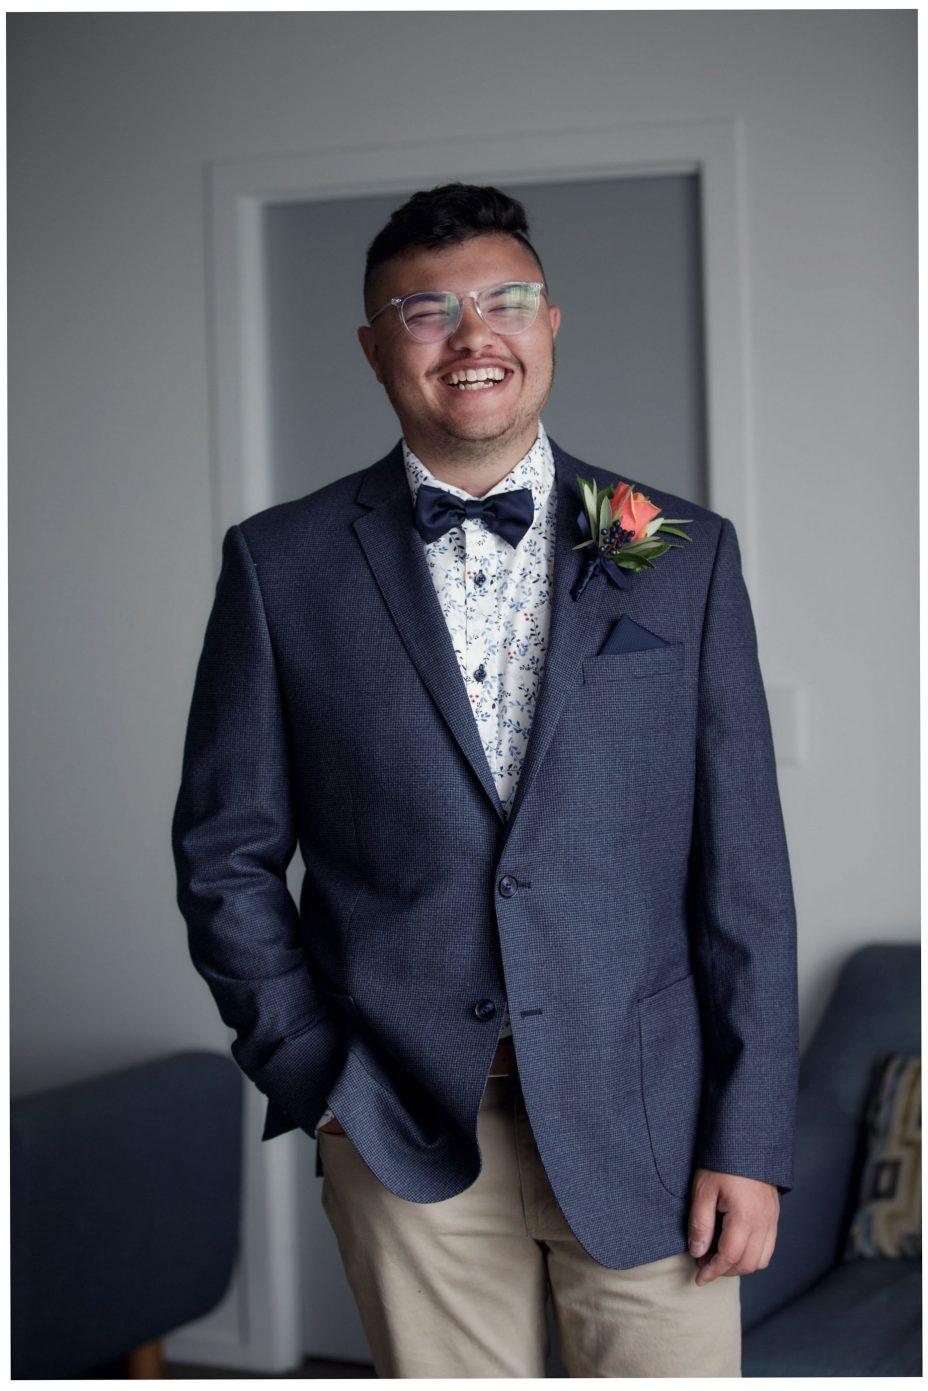 Groom dressed for his wedding smiles full of joy.